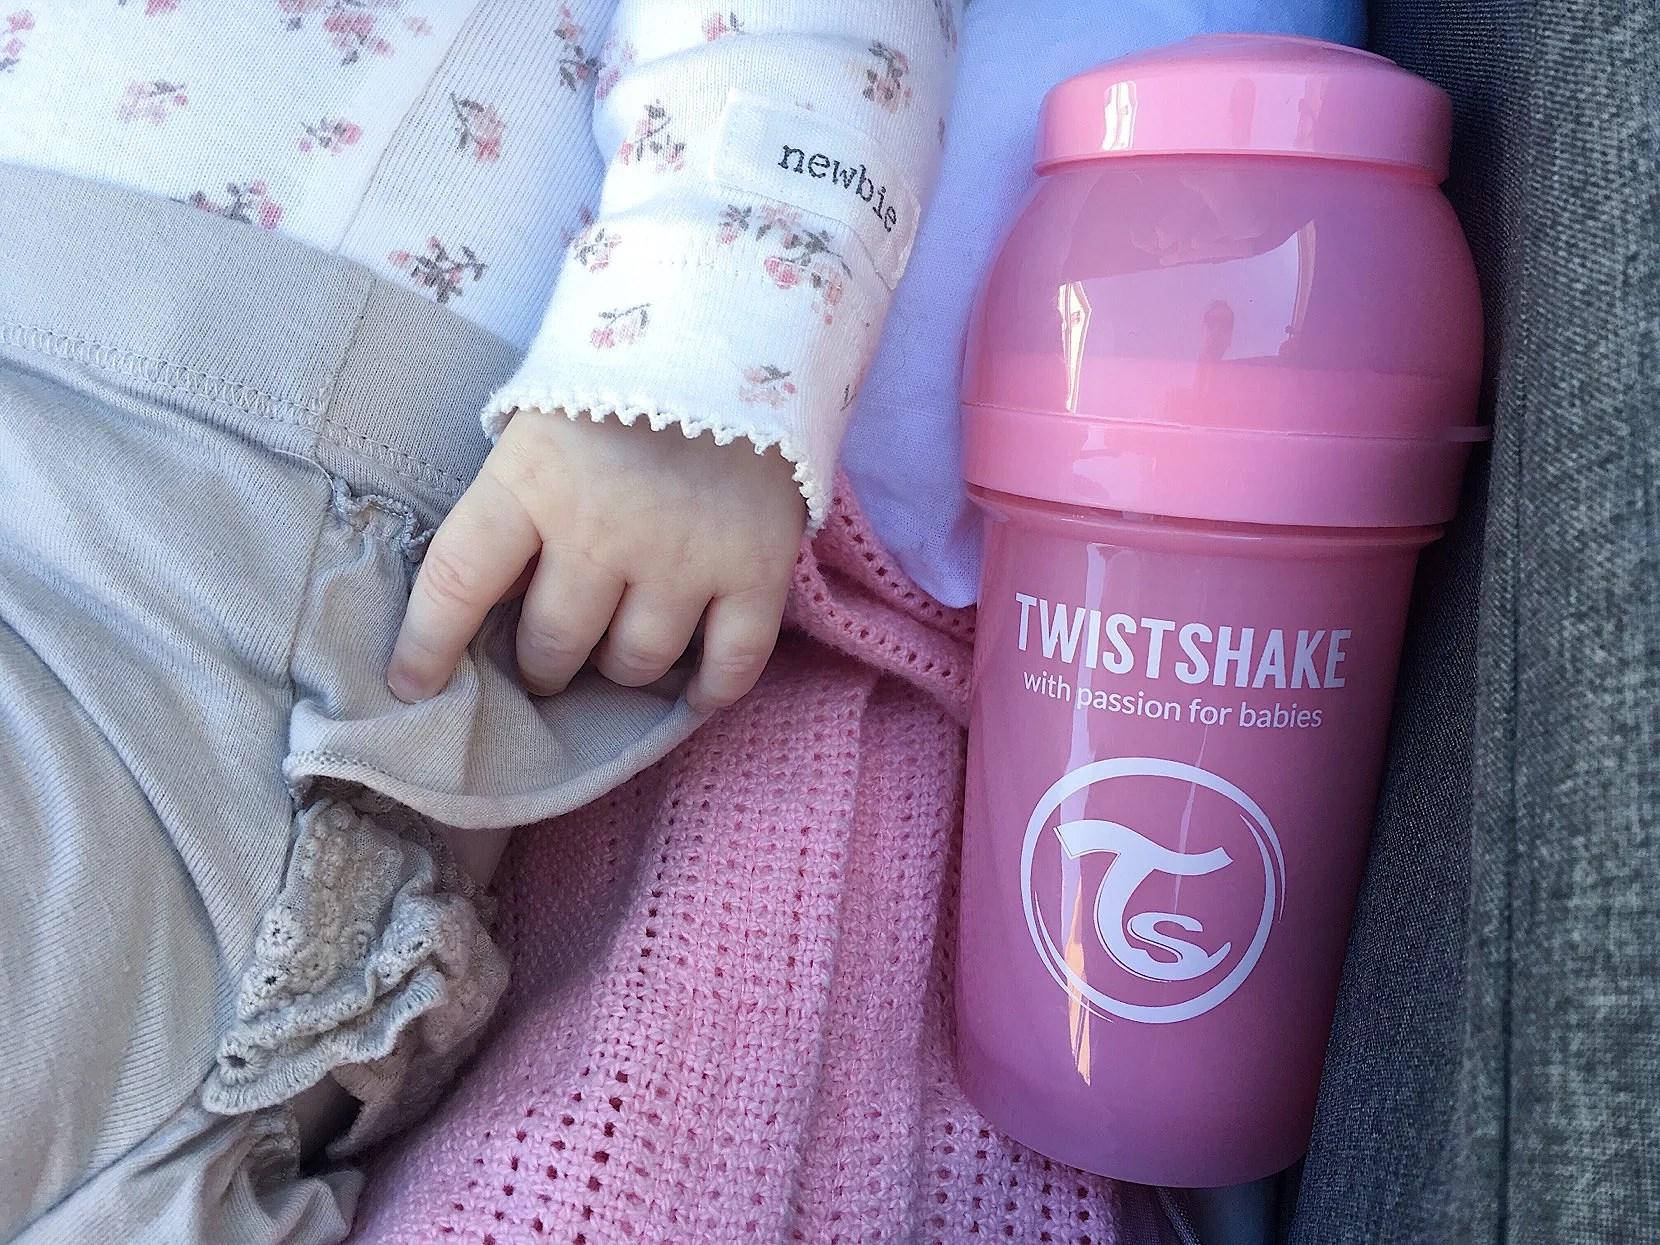 Samarbete med Twistshake